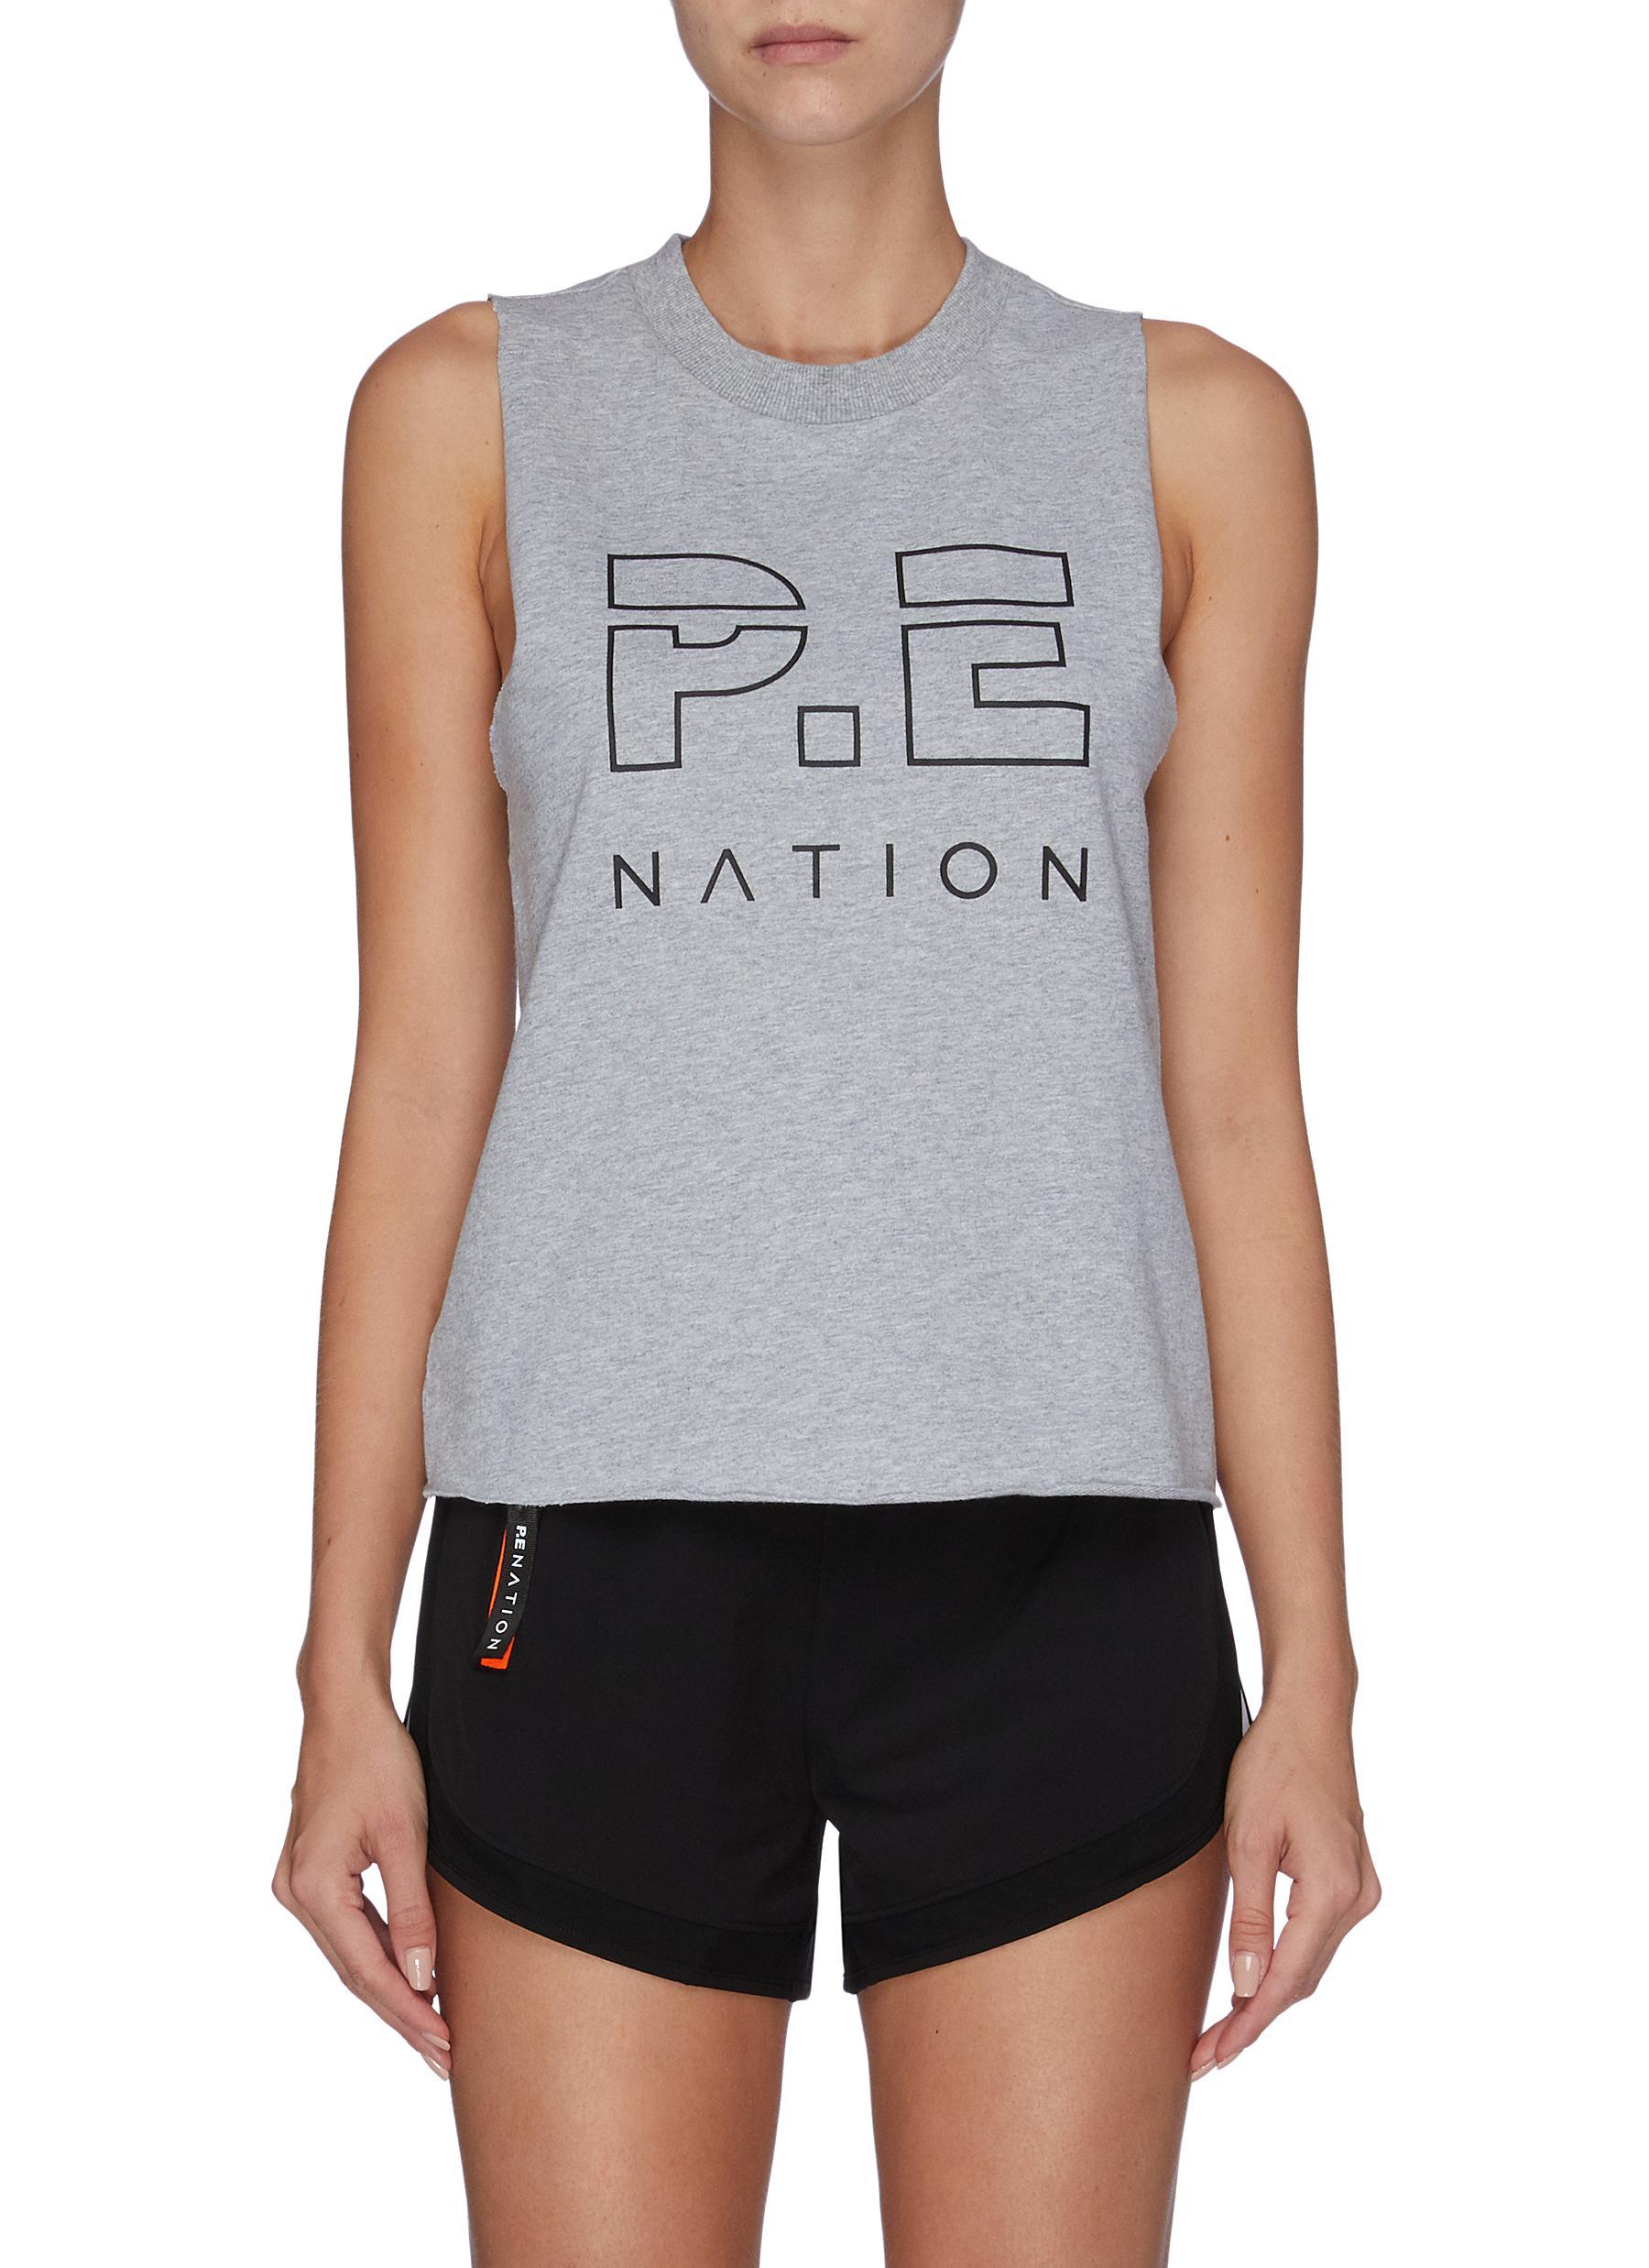 Shuffle logo print tank top by P.E Nation